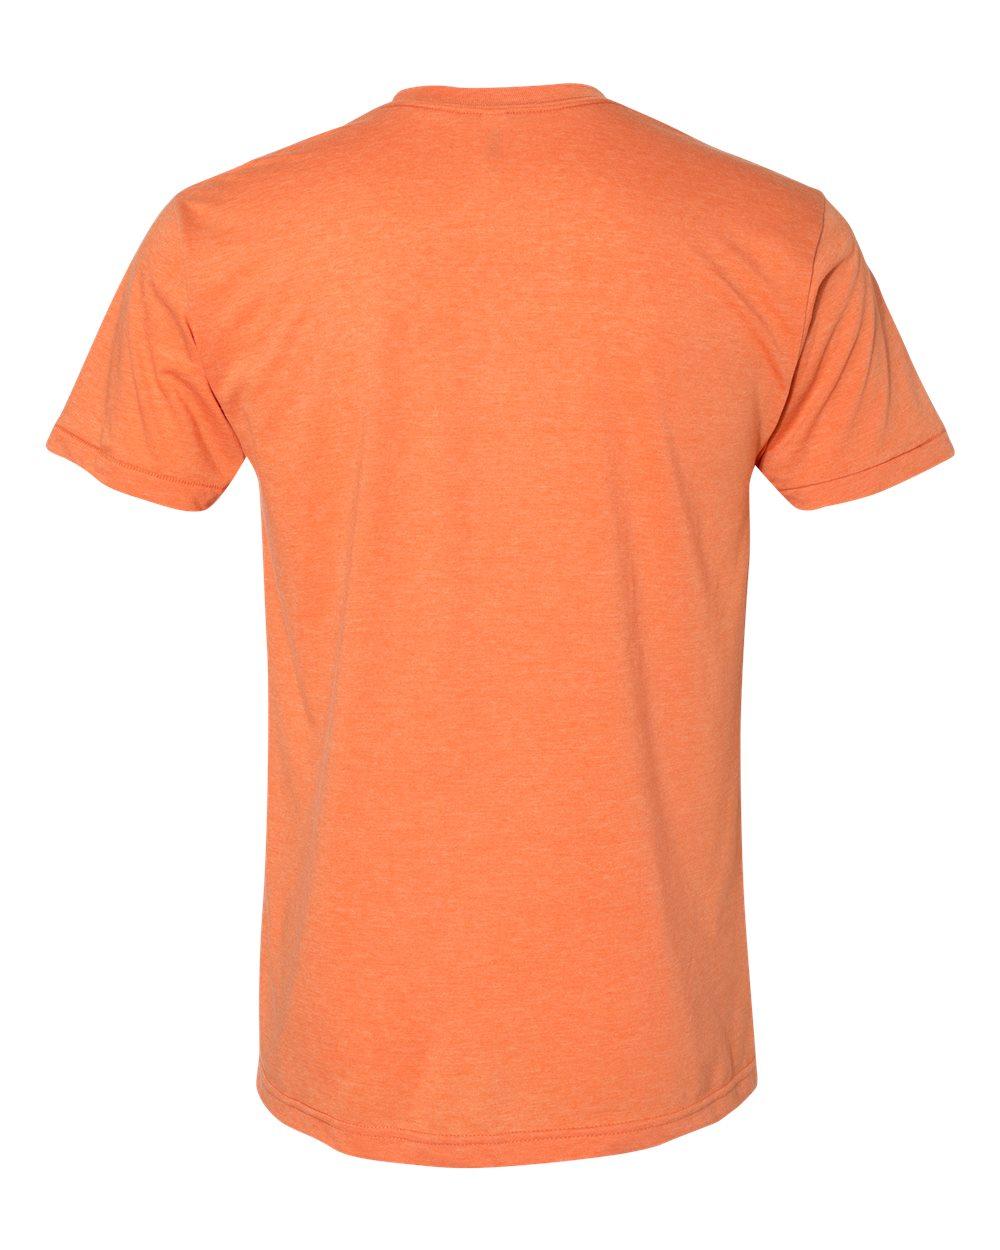 American-Apparel-Mens-Slim-Fit-50-50-Cotton-T-Shirt-Tee-BB401W-up-to-2XL thumbnail 34